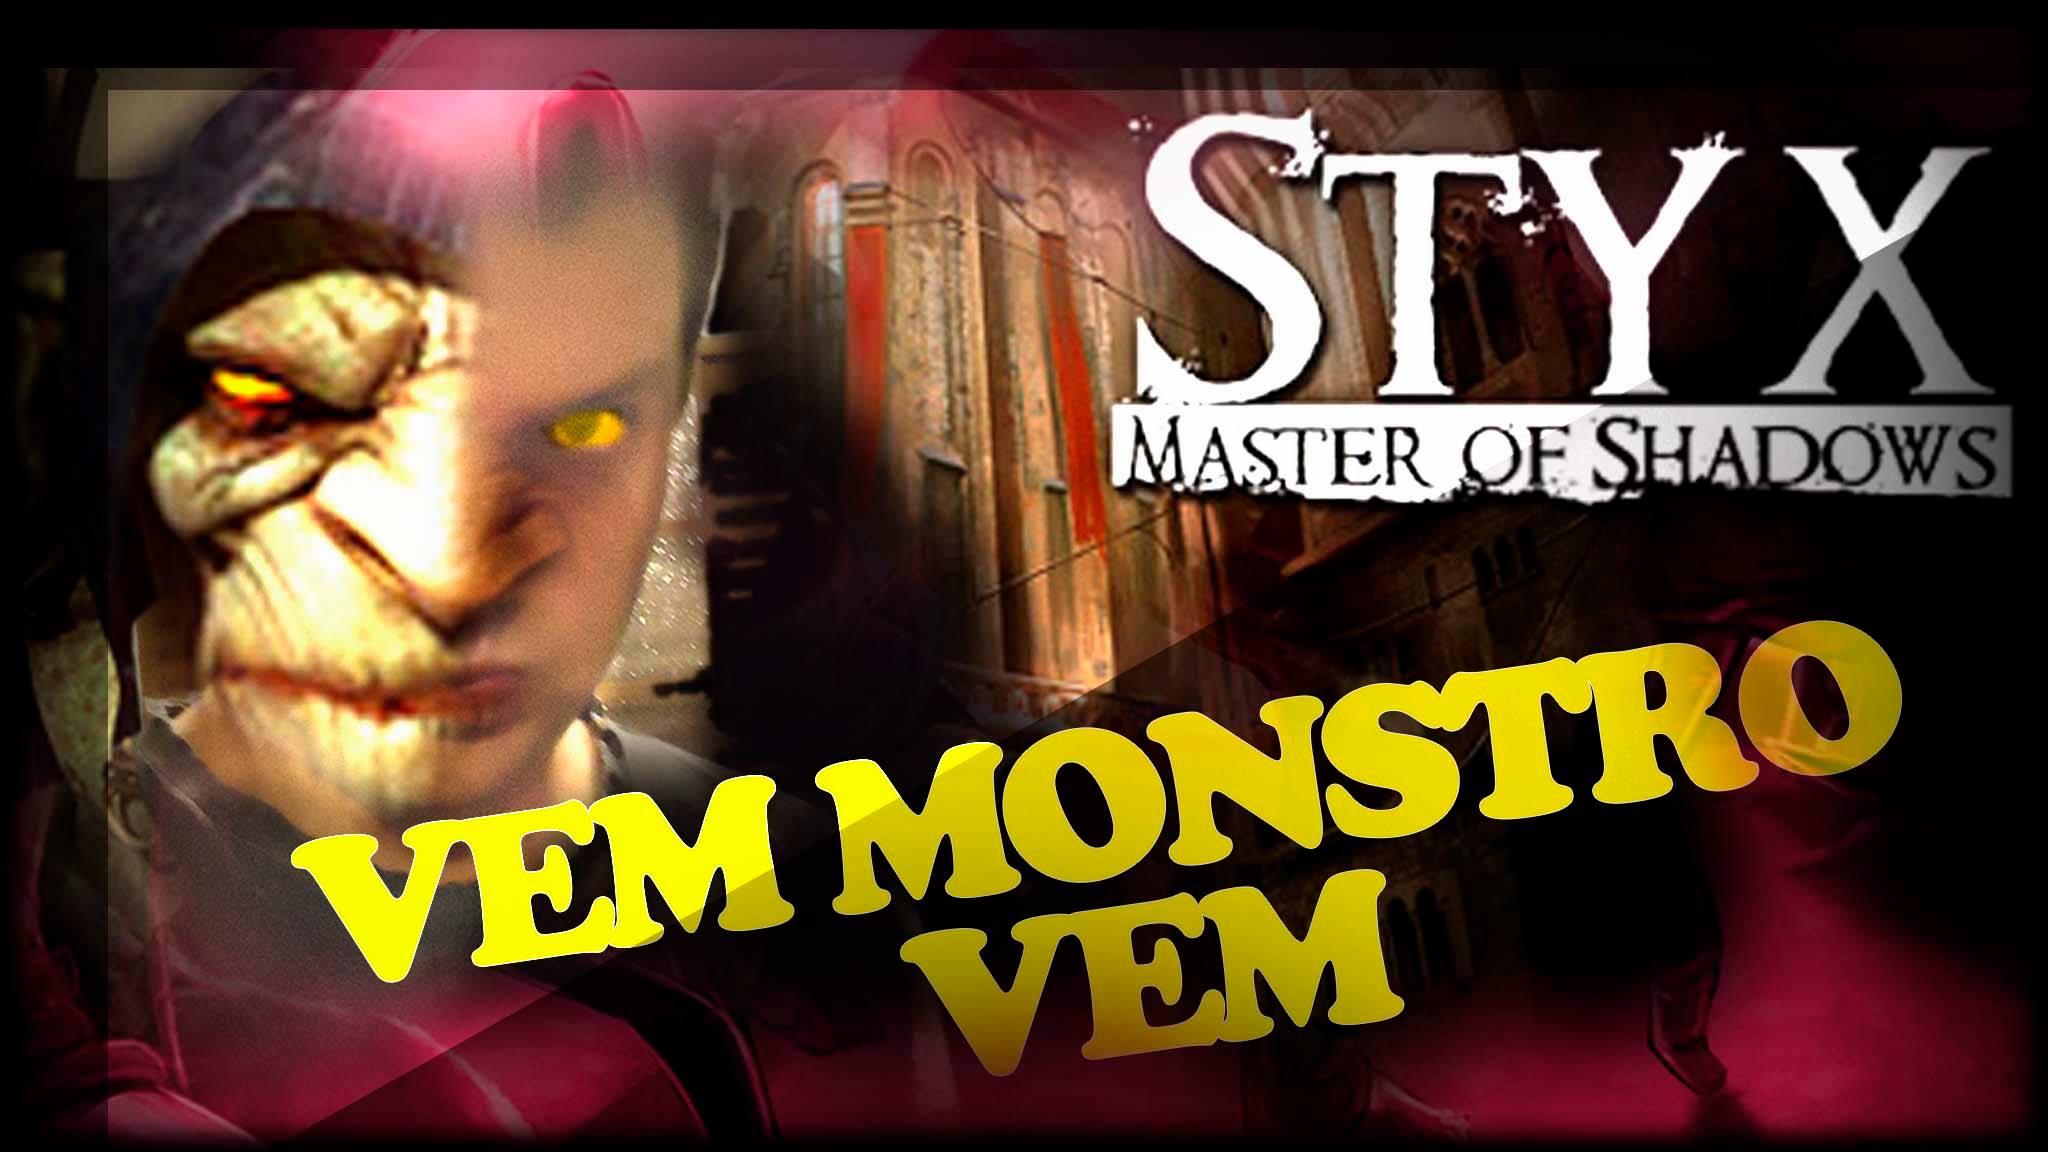 Styx Master of Shadows - Delary - Imagem